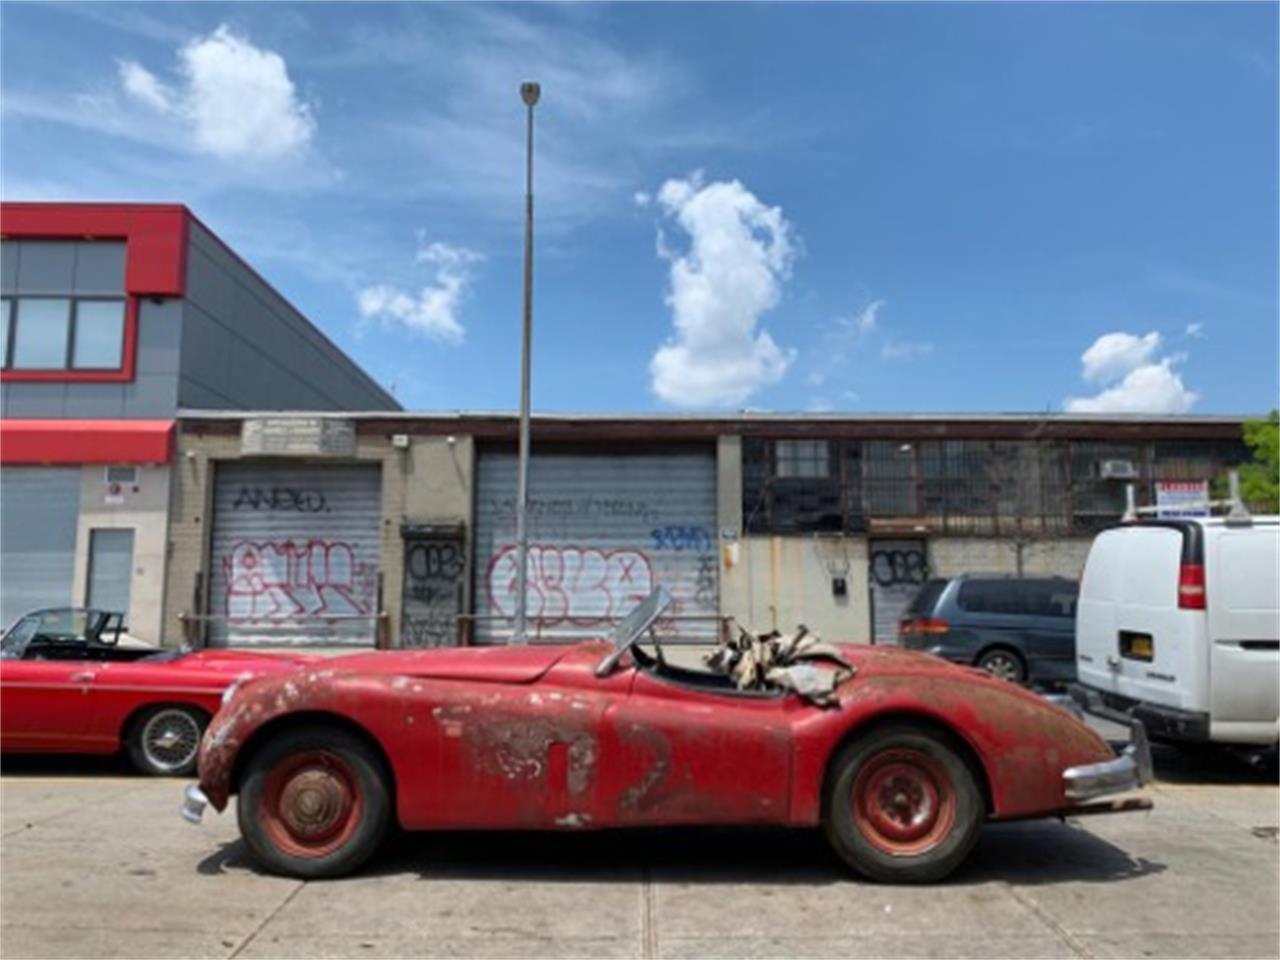 1956 Jaguar XK140 (CC-1271584) for sale in Astoria, New York